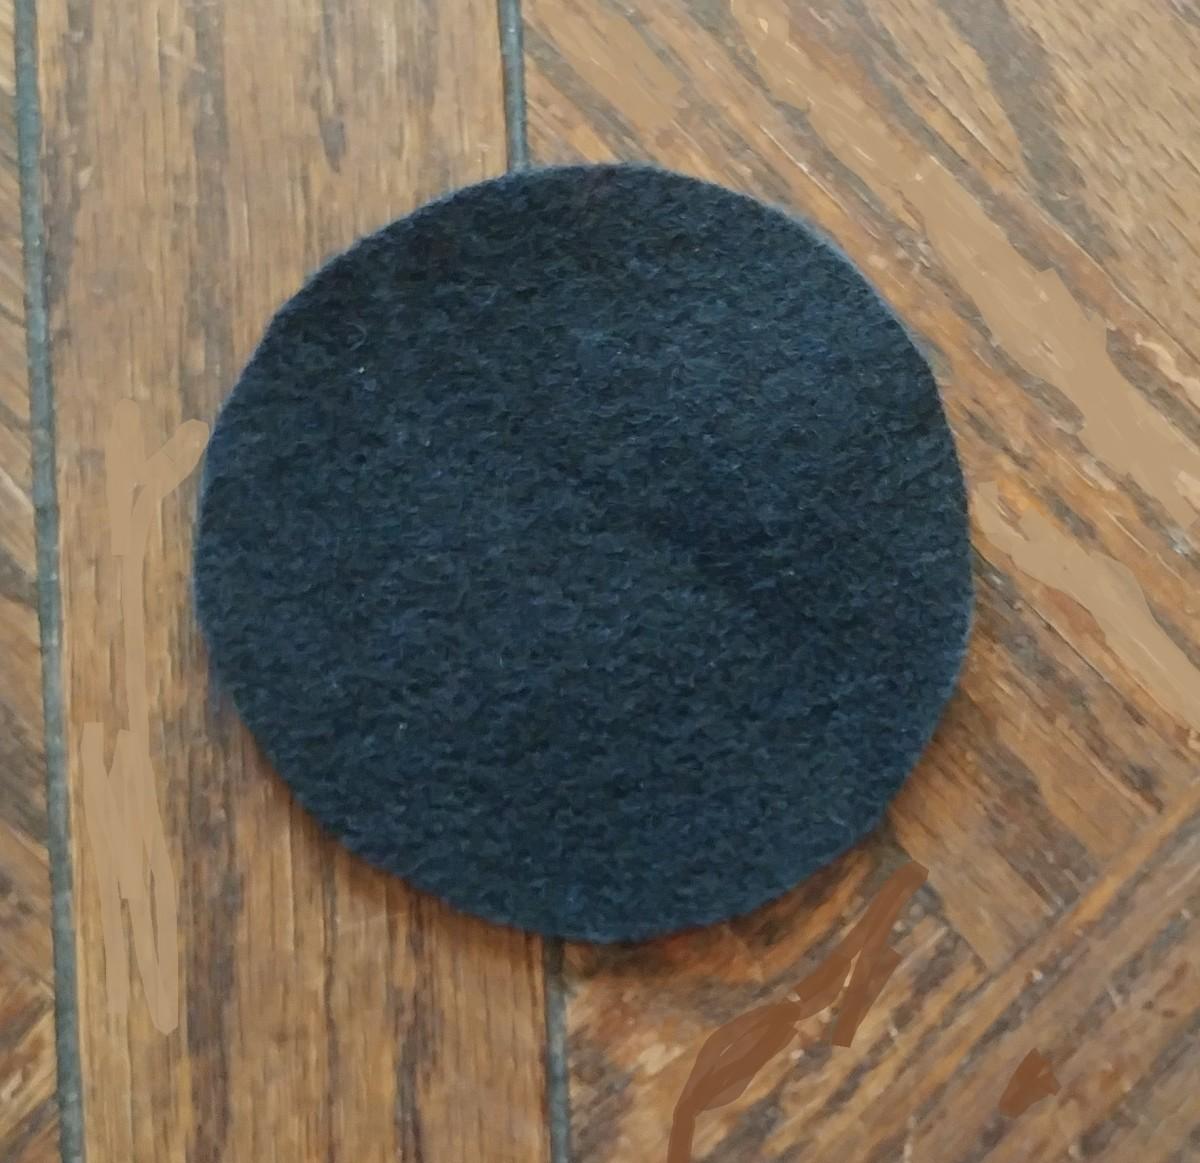 Cut a circle out of black felt. A mason jar lid is a good size to measure the shape.